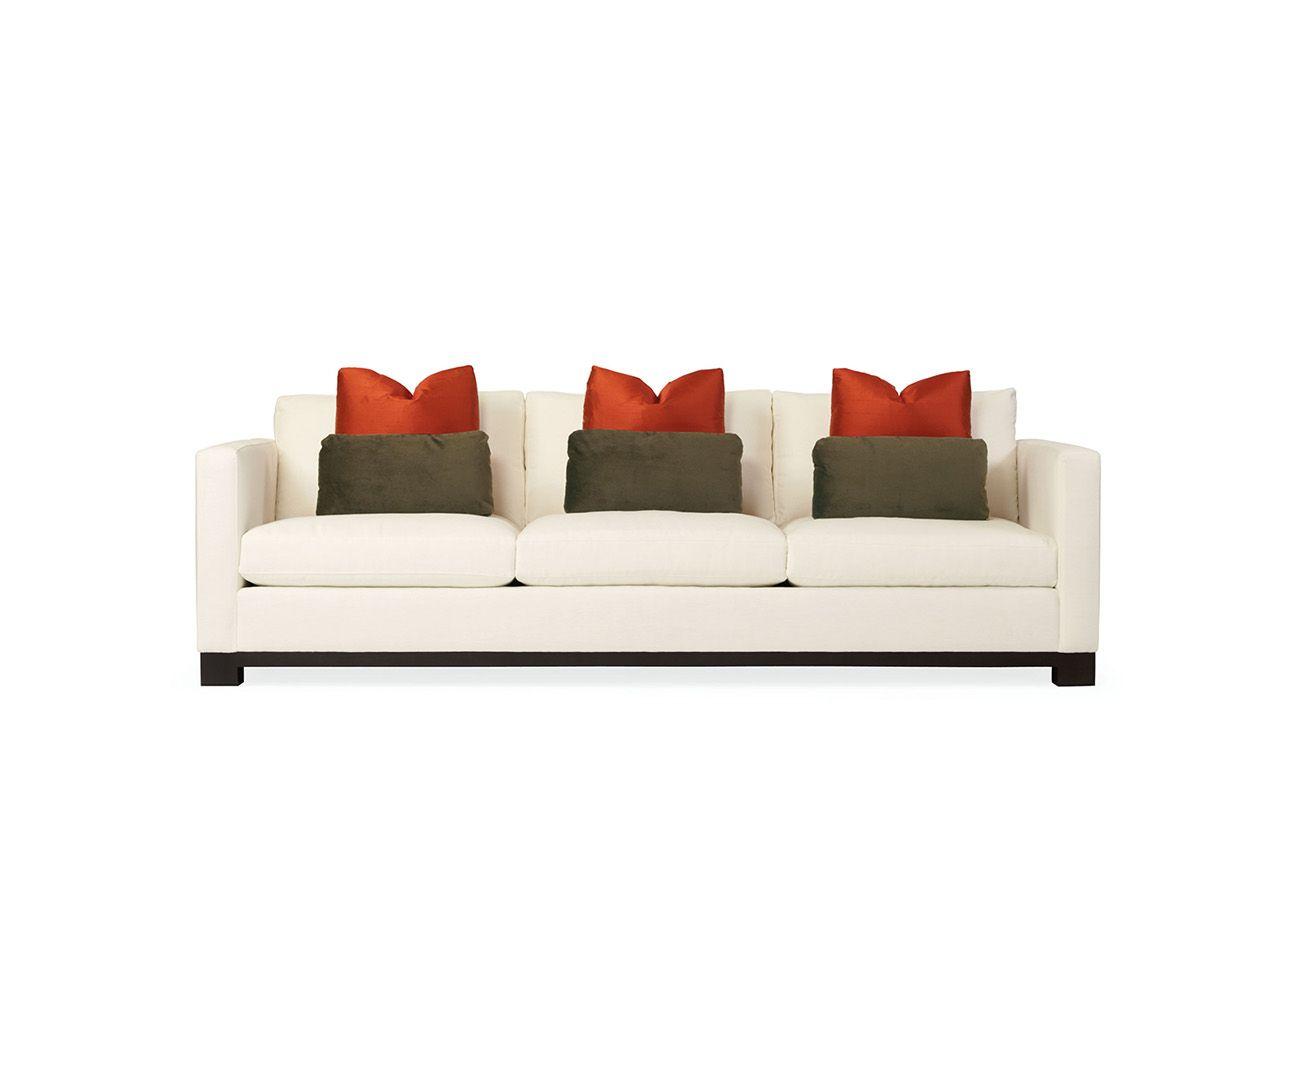 BERNHARDT LANAI SOFA amp SET Colliers Furniture Expo : N16574120001 from www.thefurnitureexpo.com size 1300 x 1070 jpeg 35kB